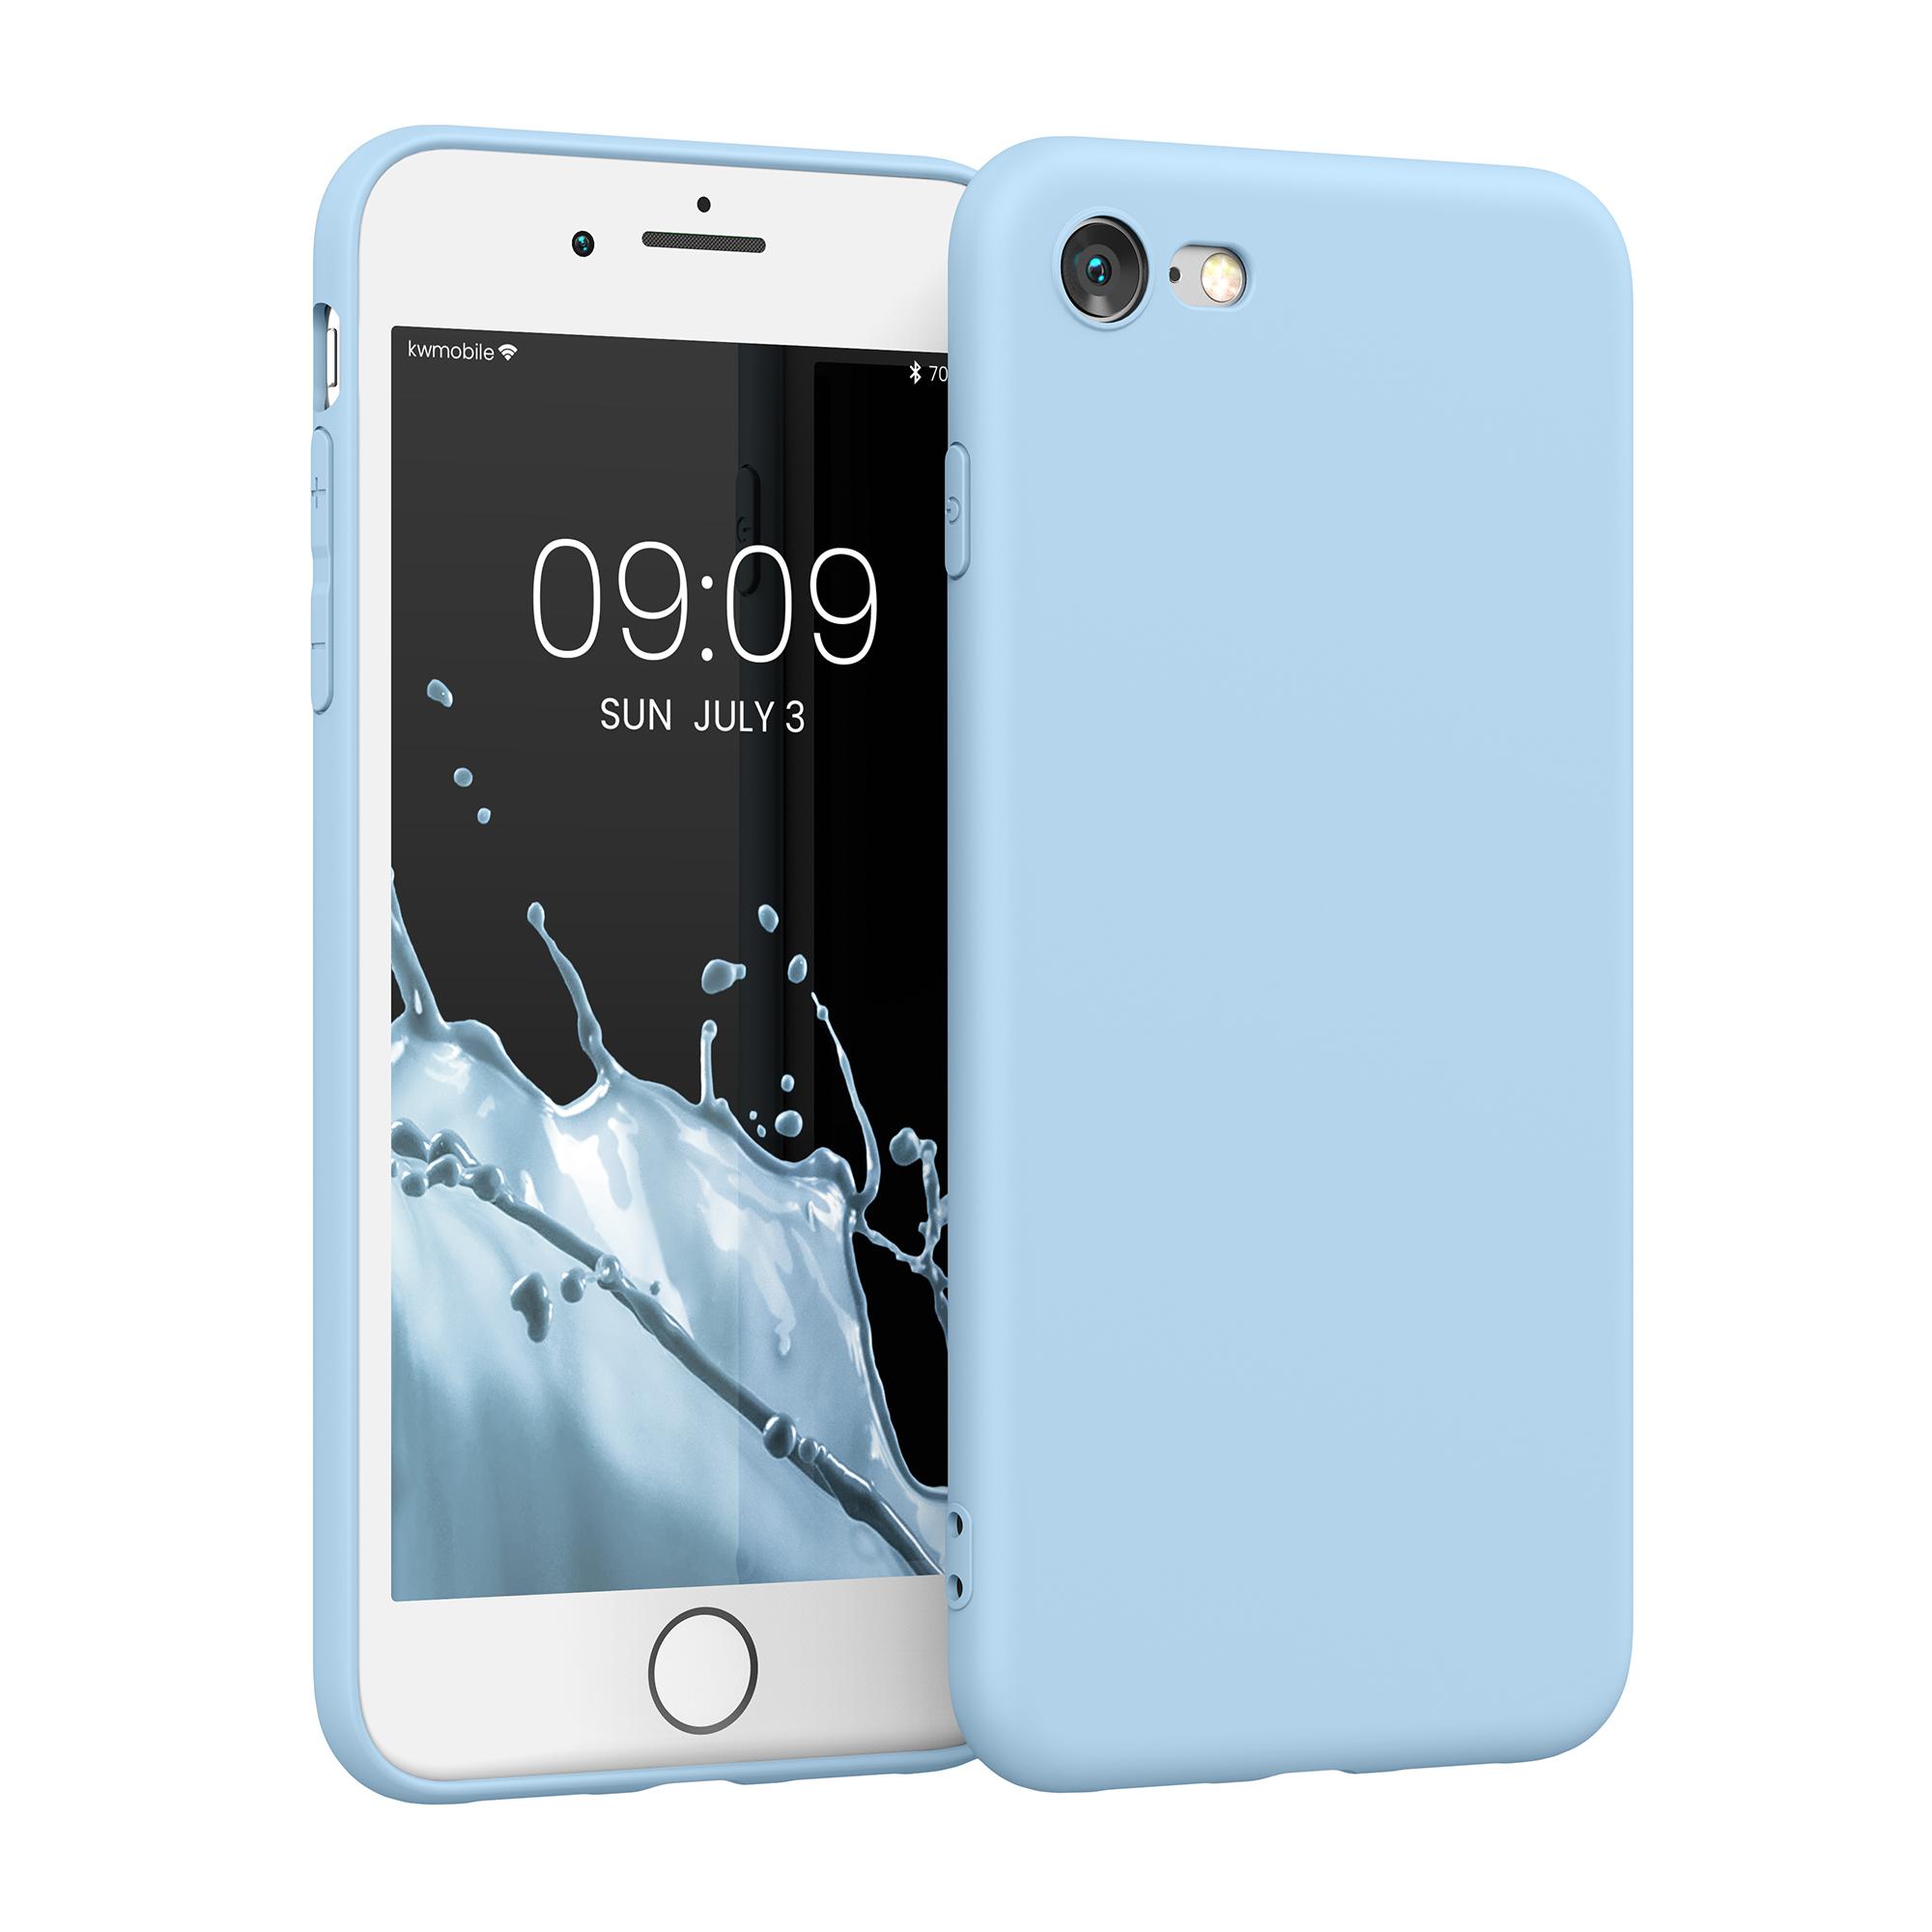 AKCE IHNED! Silikonové TPU pouzdro pro Apple iPhone 7 / 8 / SE  Light Blue Matte